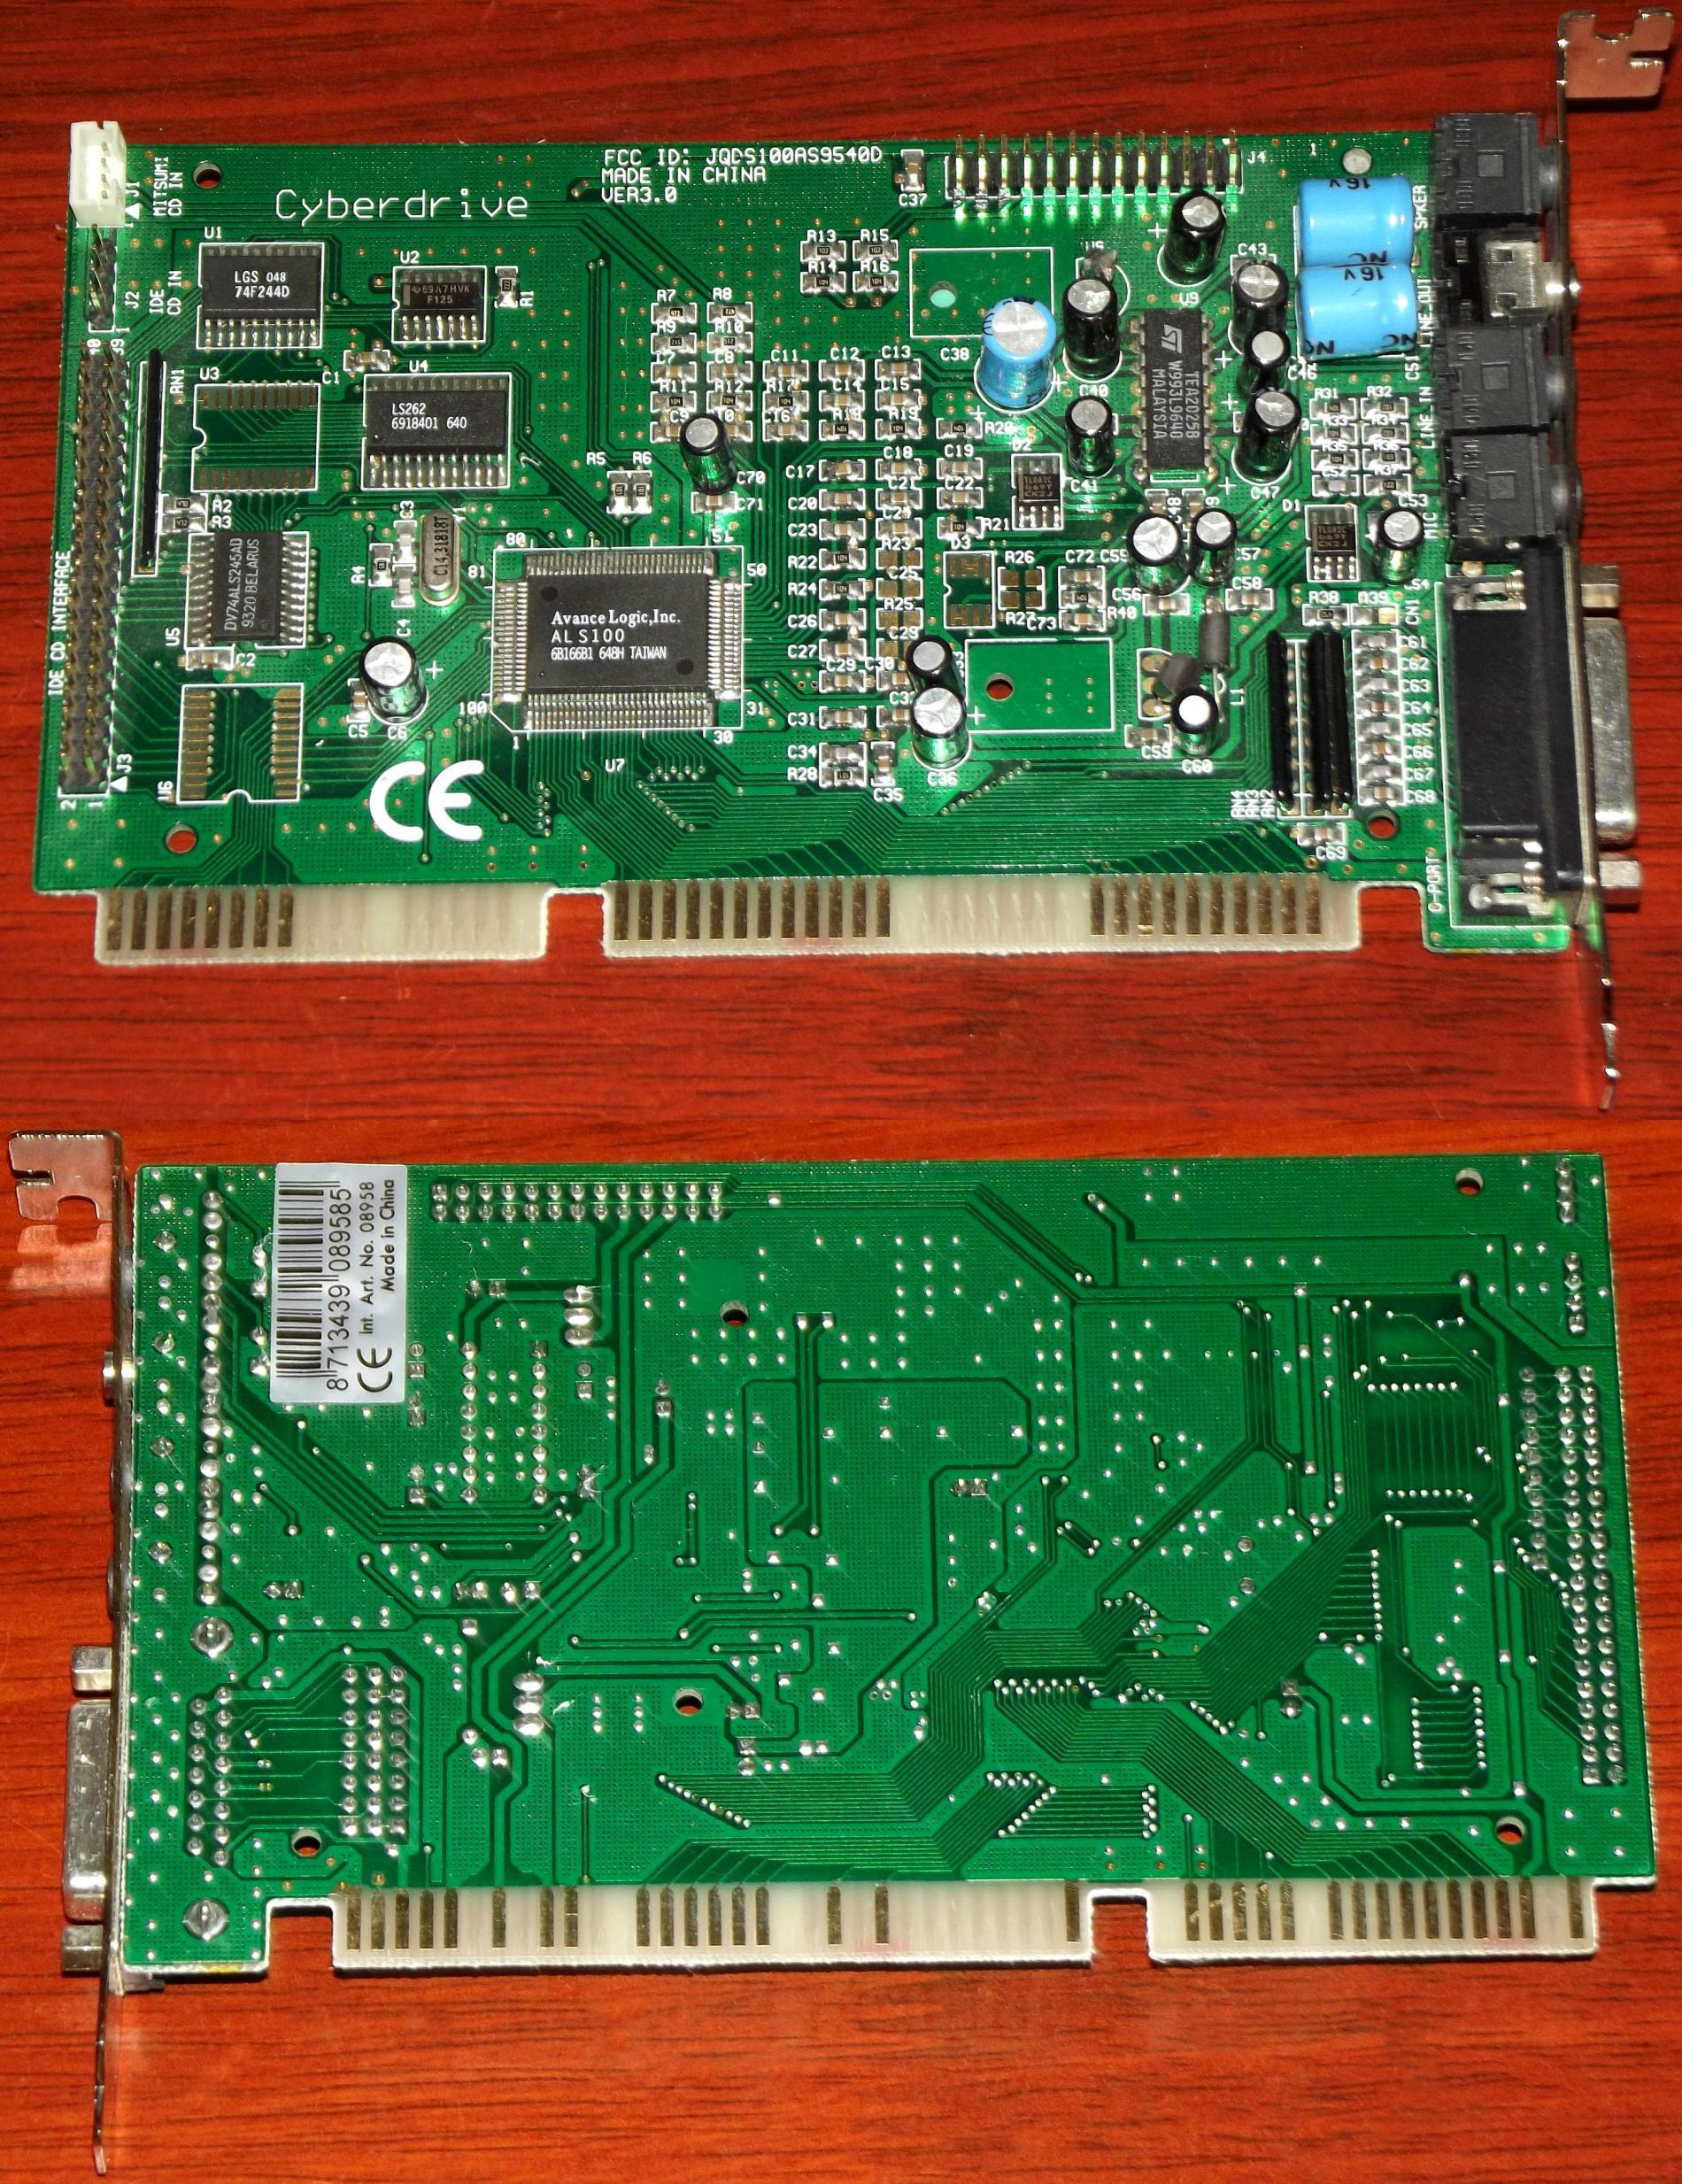 Cyberdrive-Avance-Logic-ALS100-FCC-ID-JQDS100AS9540D-PCI-Soudkarte-mit-IDE-Interface.jpg